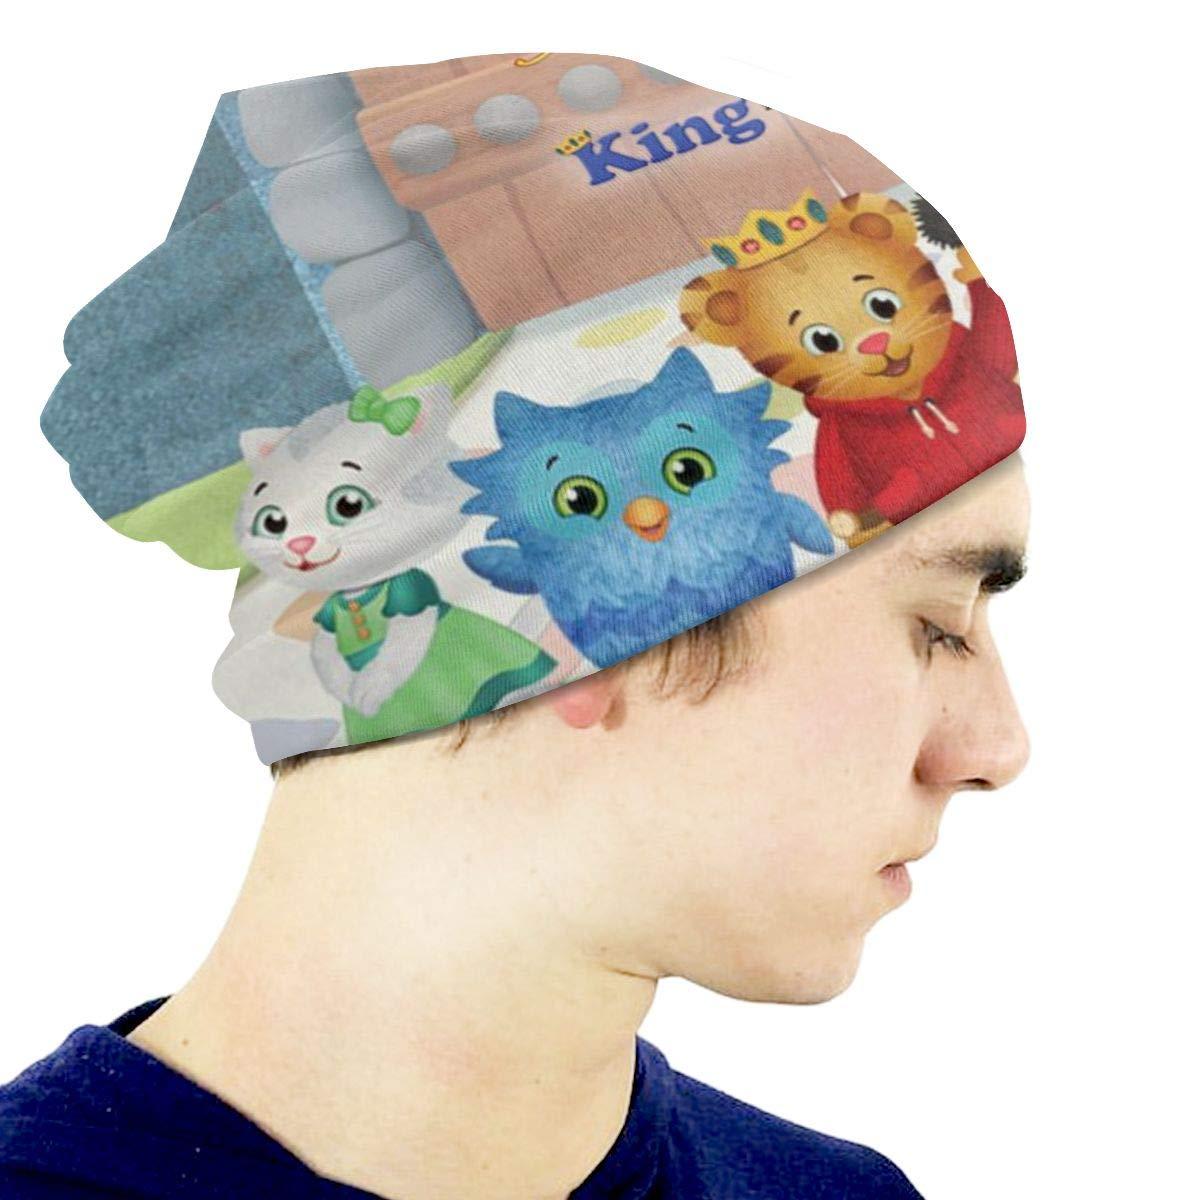 3D Daniel Tigers Neighborhood Unisex Slouchy Knit Beanie Hats Cool Skull Caps for Kids Boys Girls 3-15 Years